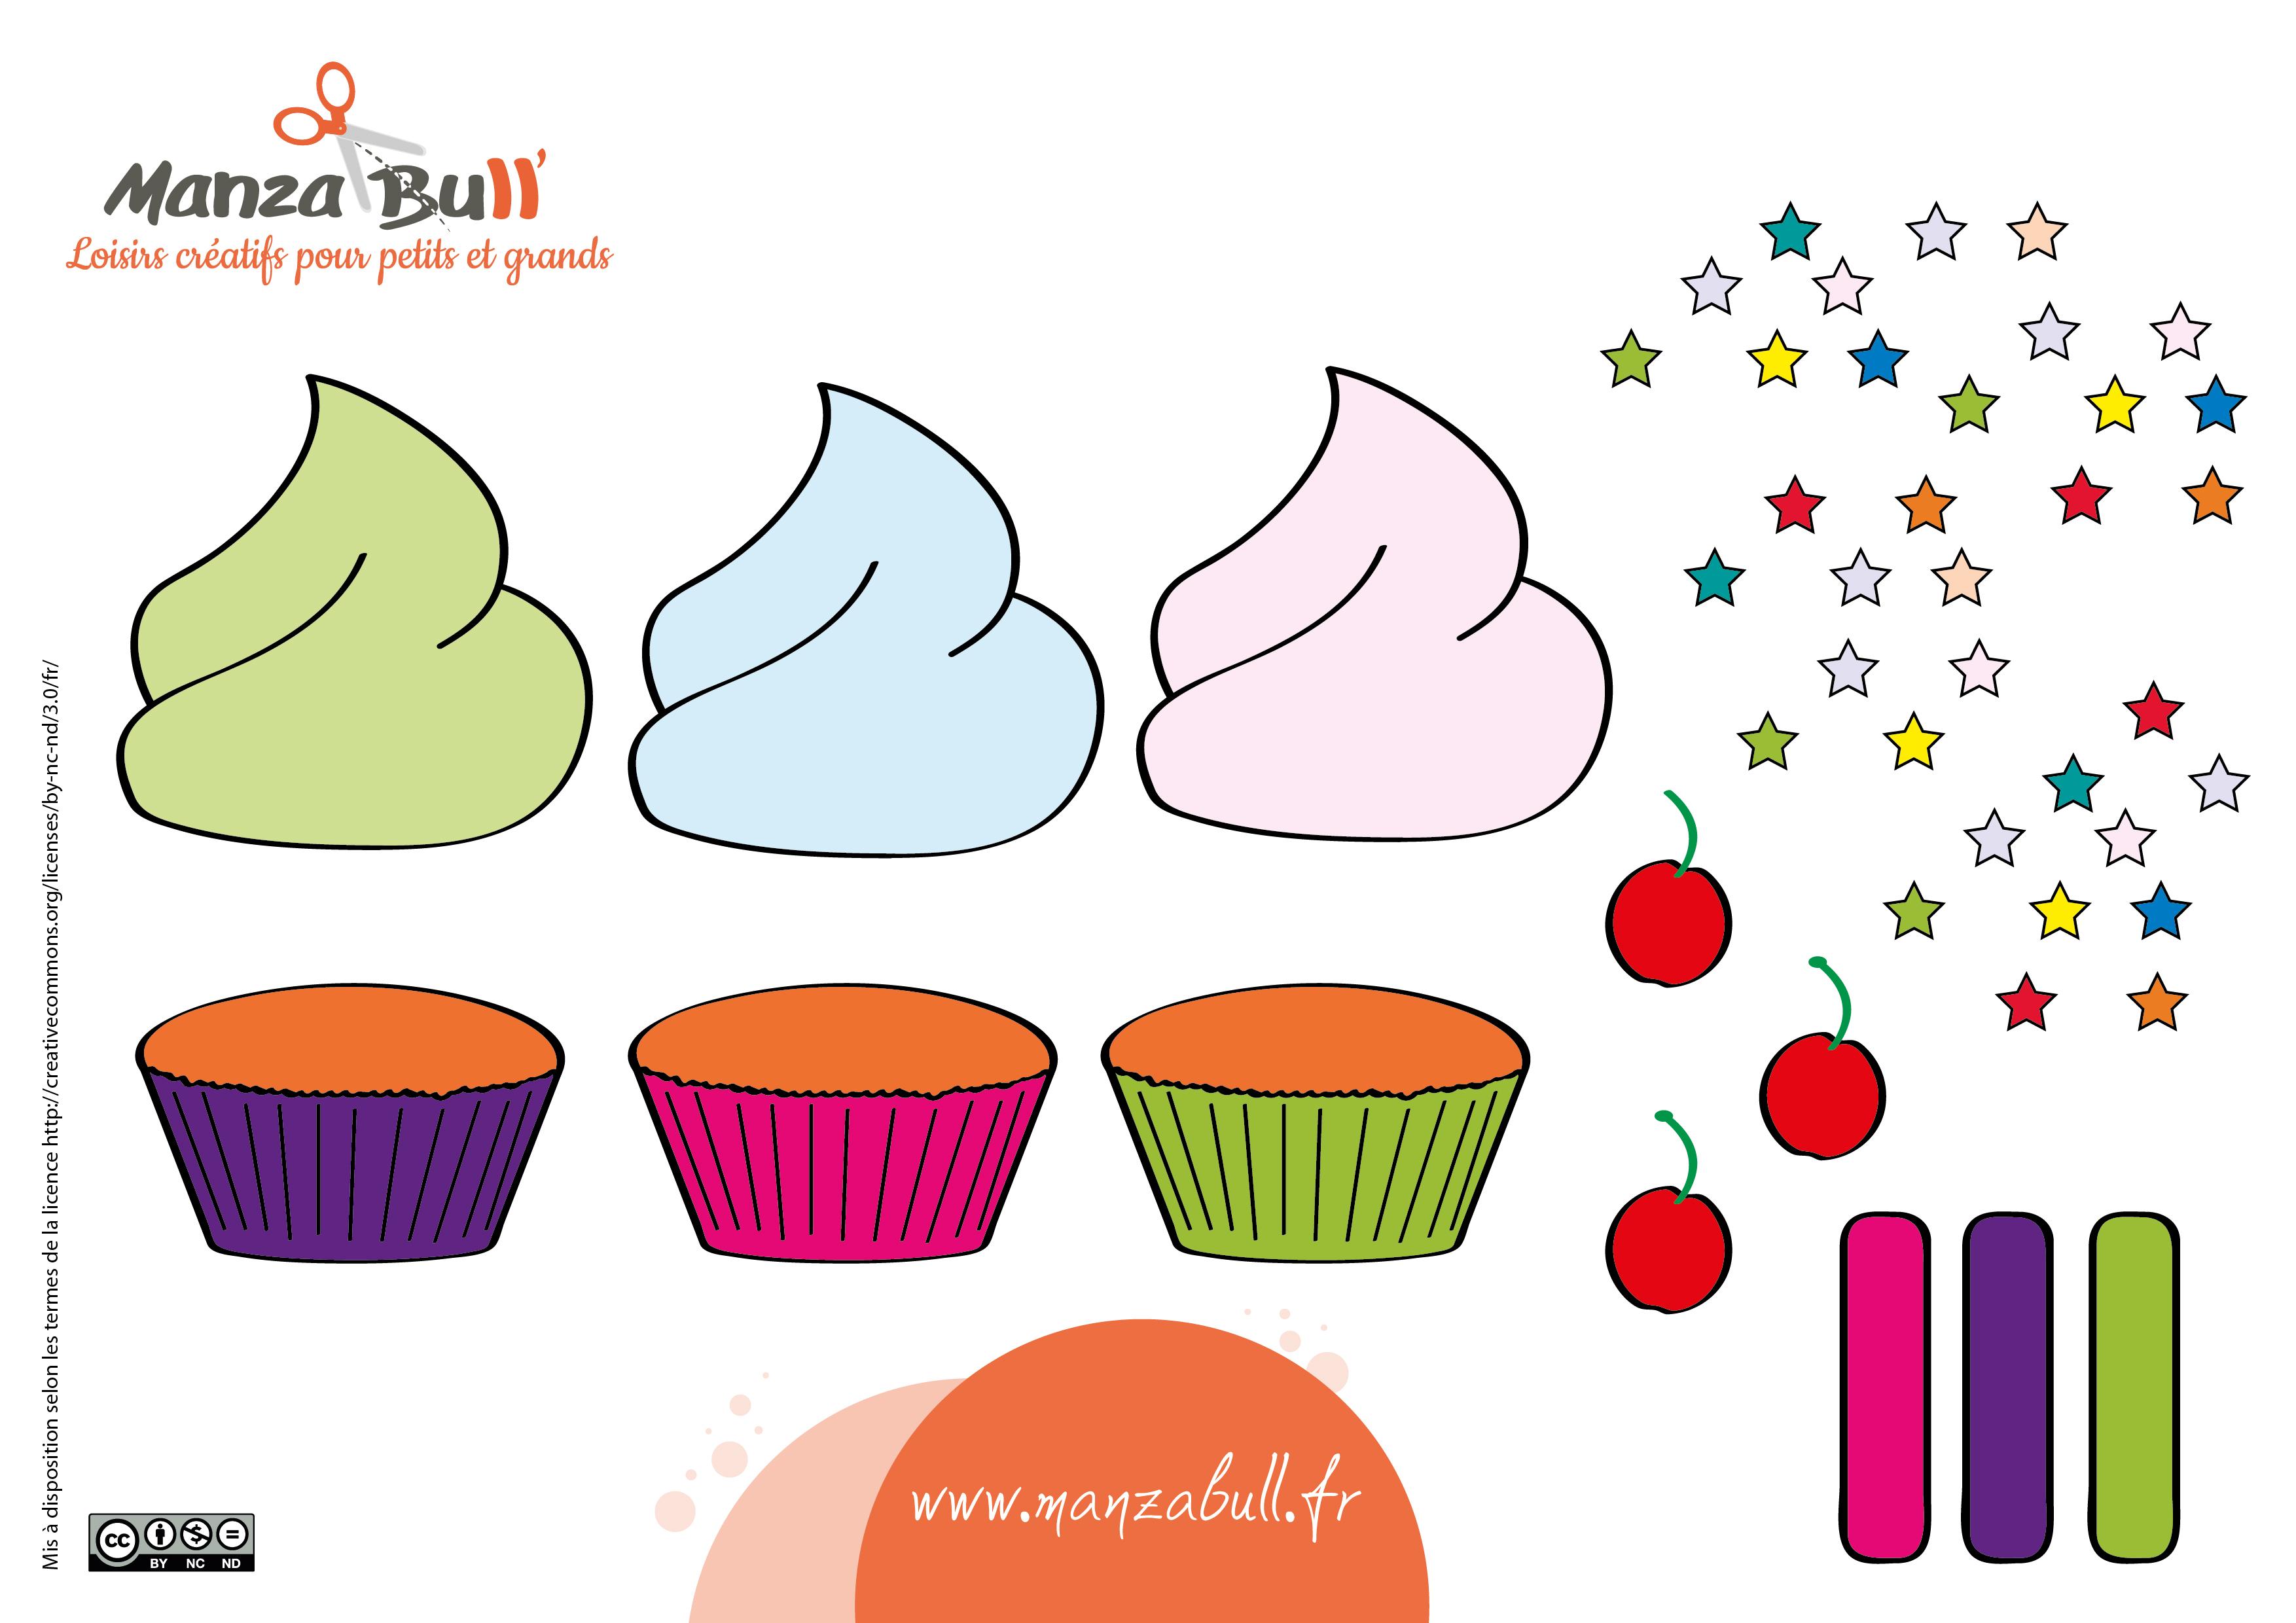 manzabull_cupcakes-01